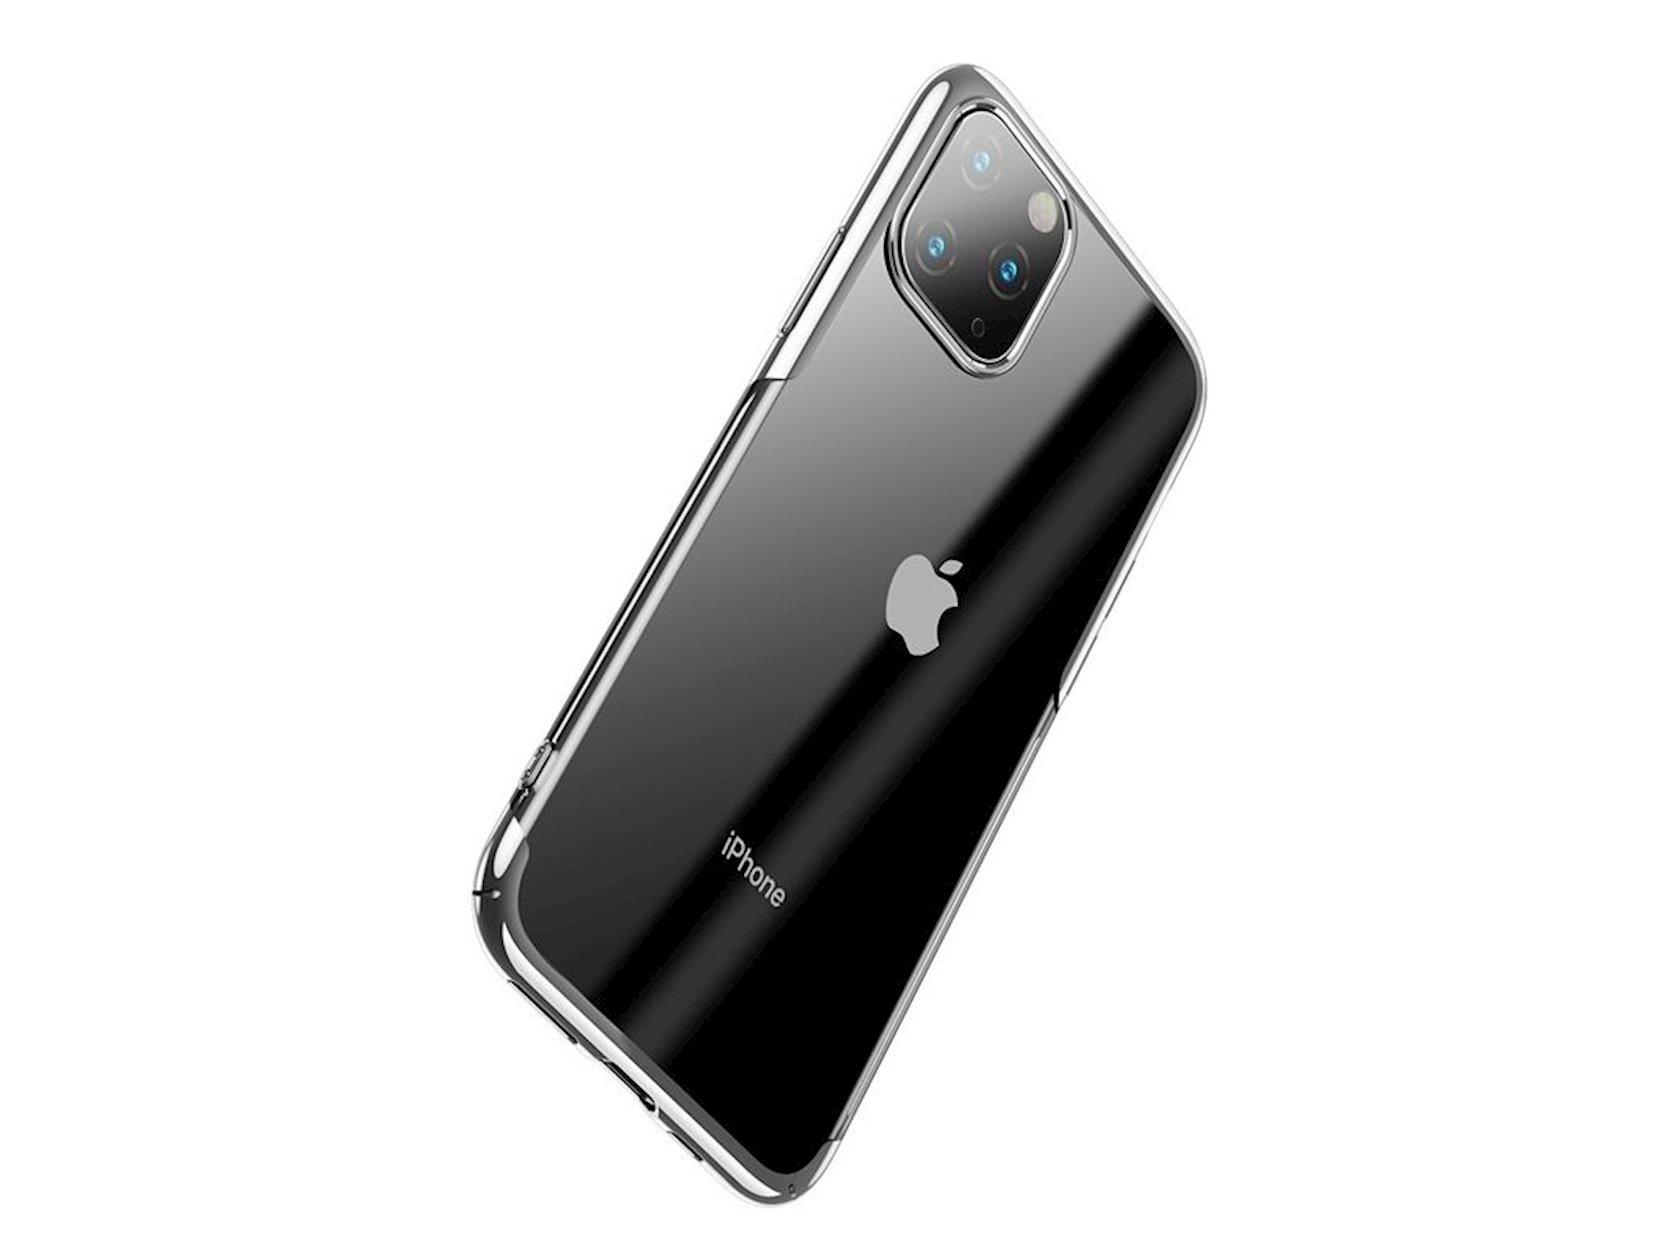 Çexol smartfon üçün Baseus Glitter Apple iPhone 11 Pro Max Silver